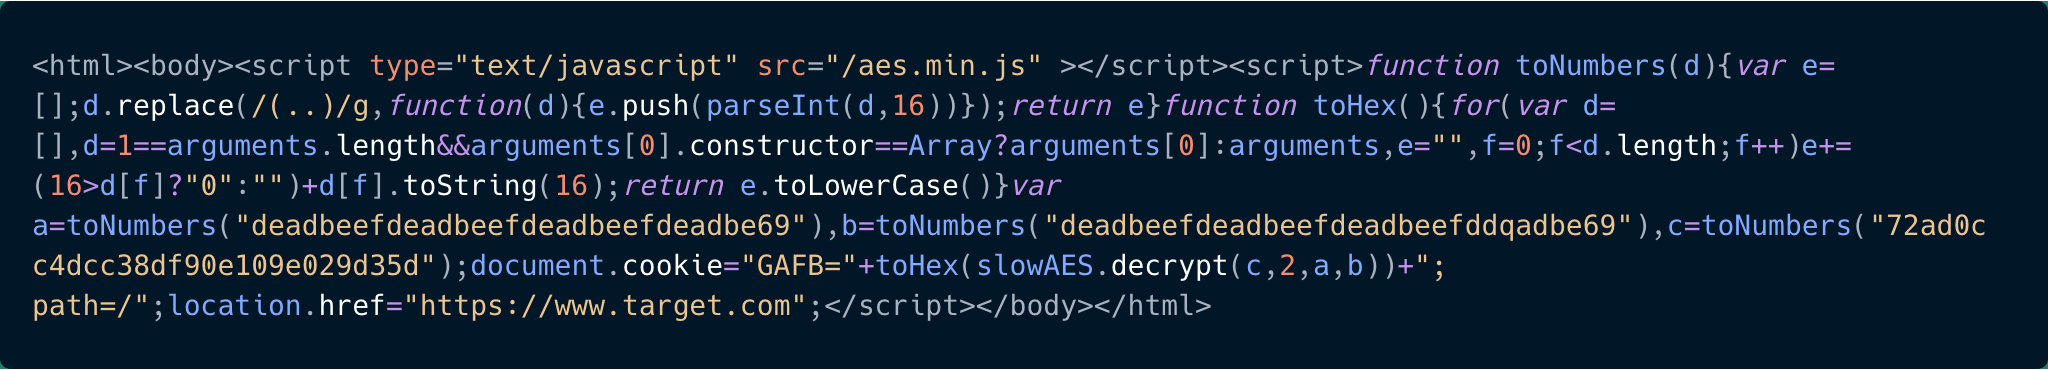 Javascript code snippet